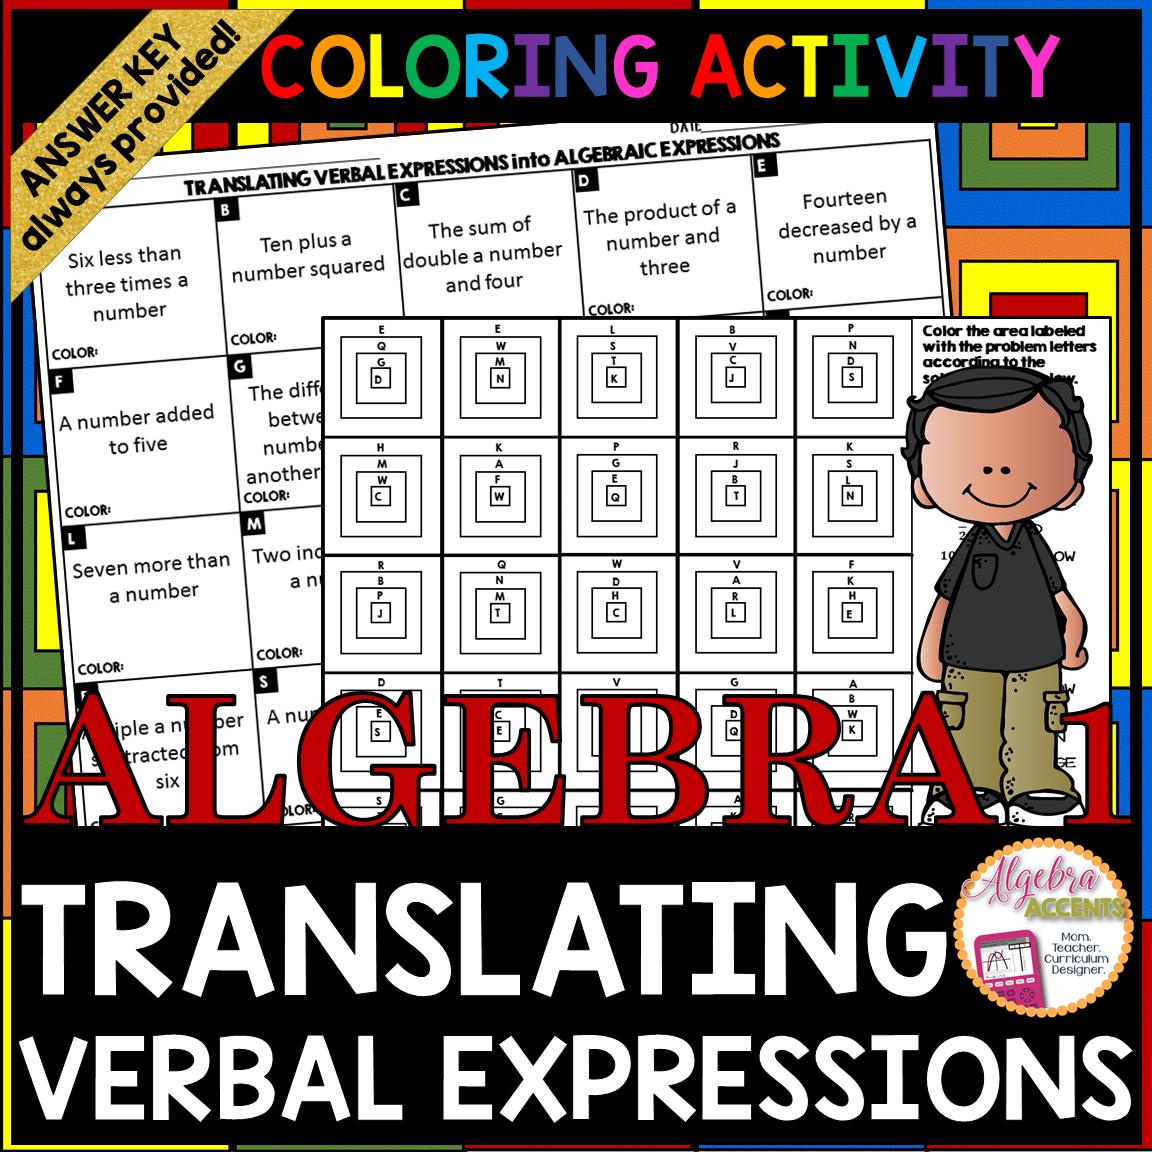 Translating Algebraic Expressions Granny Squares Coloring